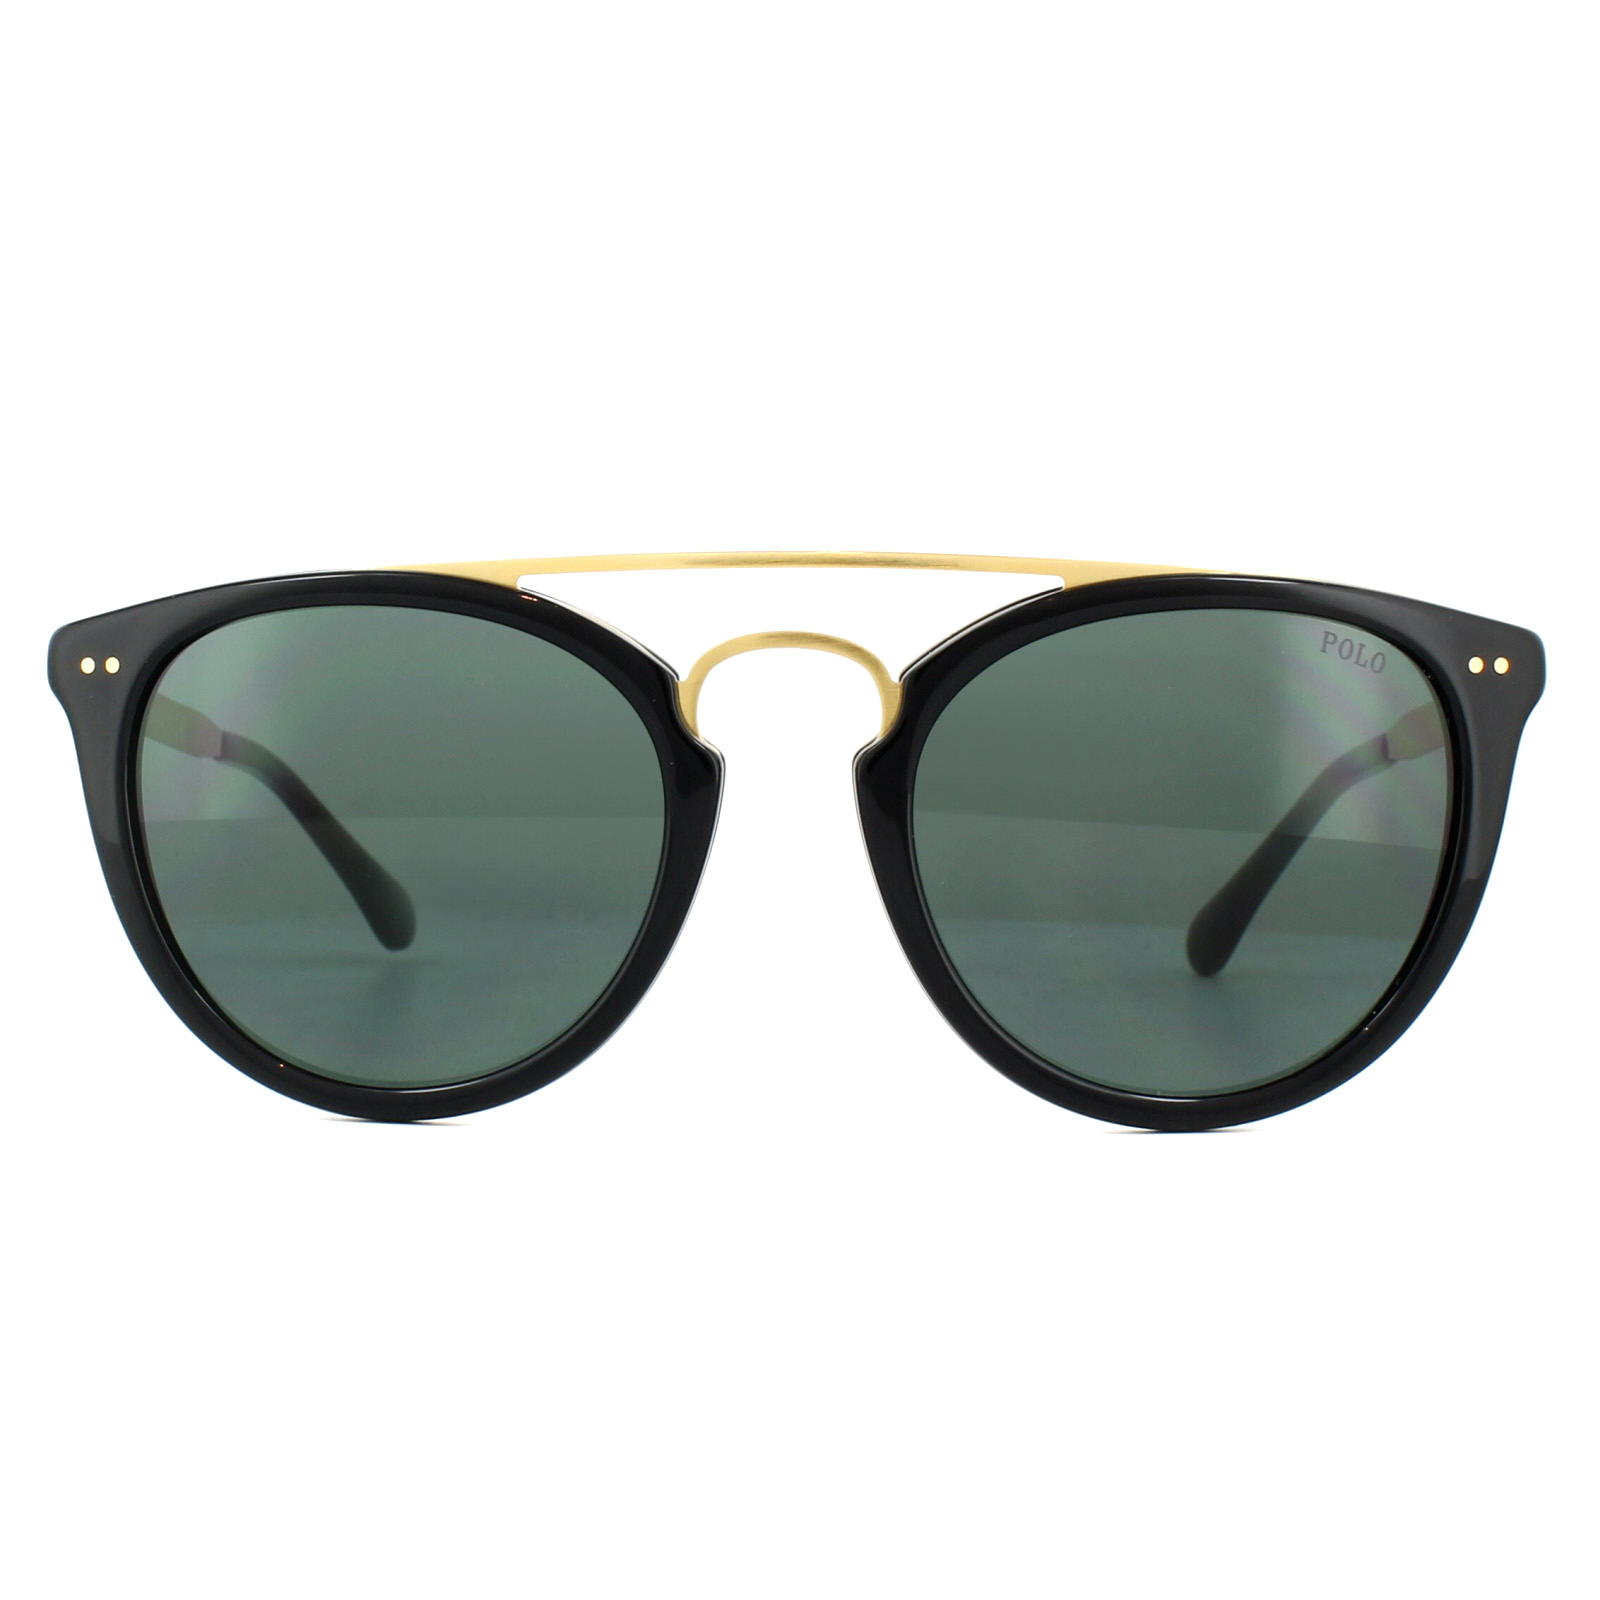 91ced80801ac1 Sentinel Polo Ralph Lauren Sunglasses PH4121 500171 Shiny Black Green